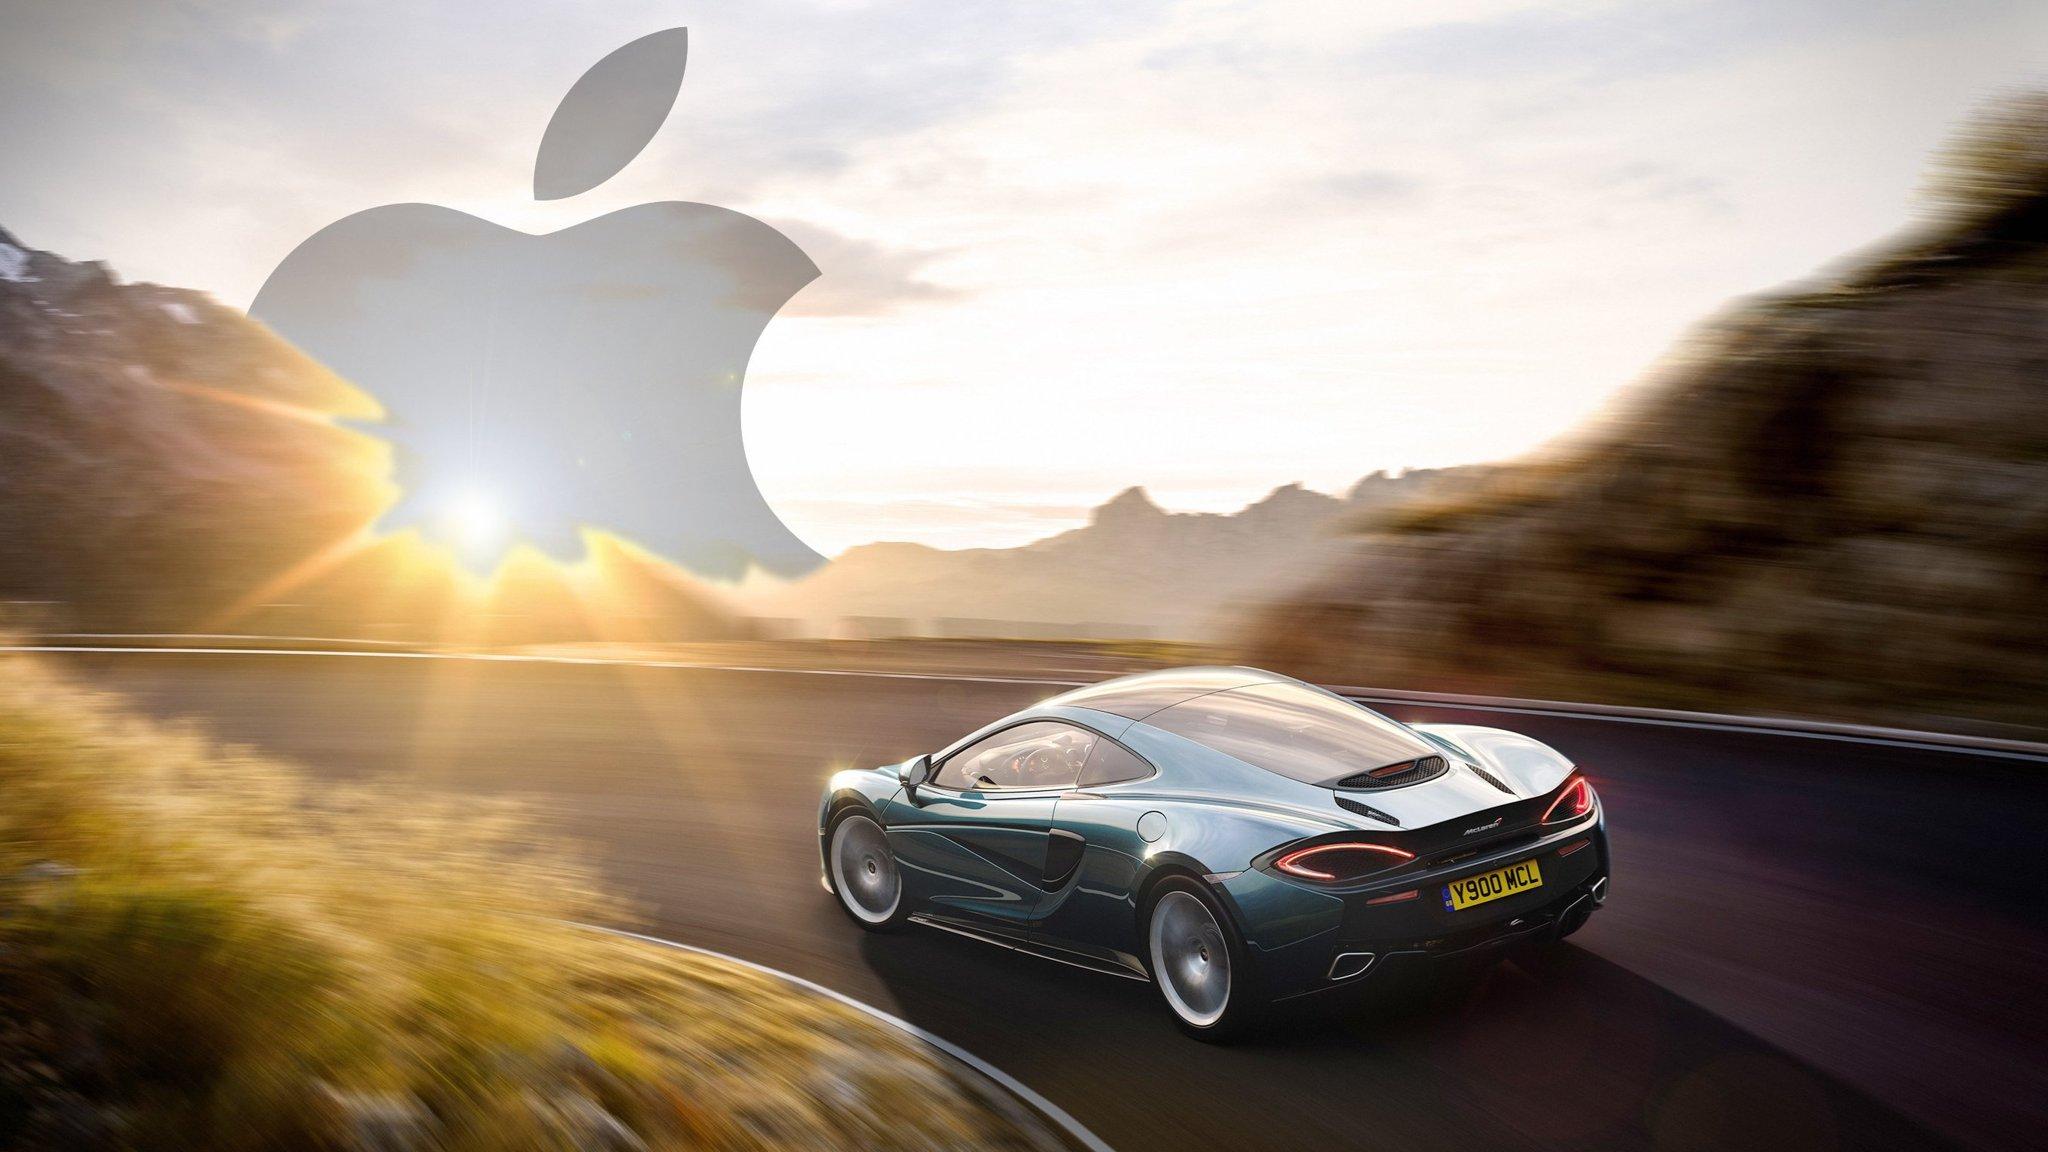 Apple podría comprar McLaren